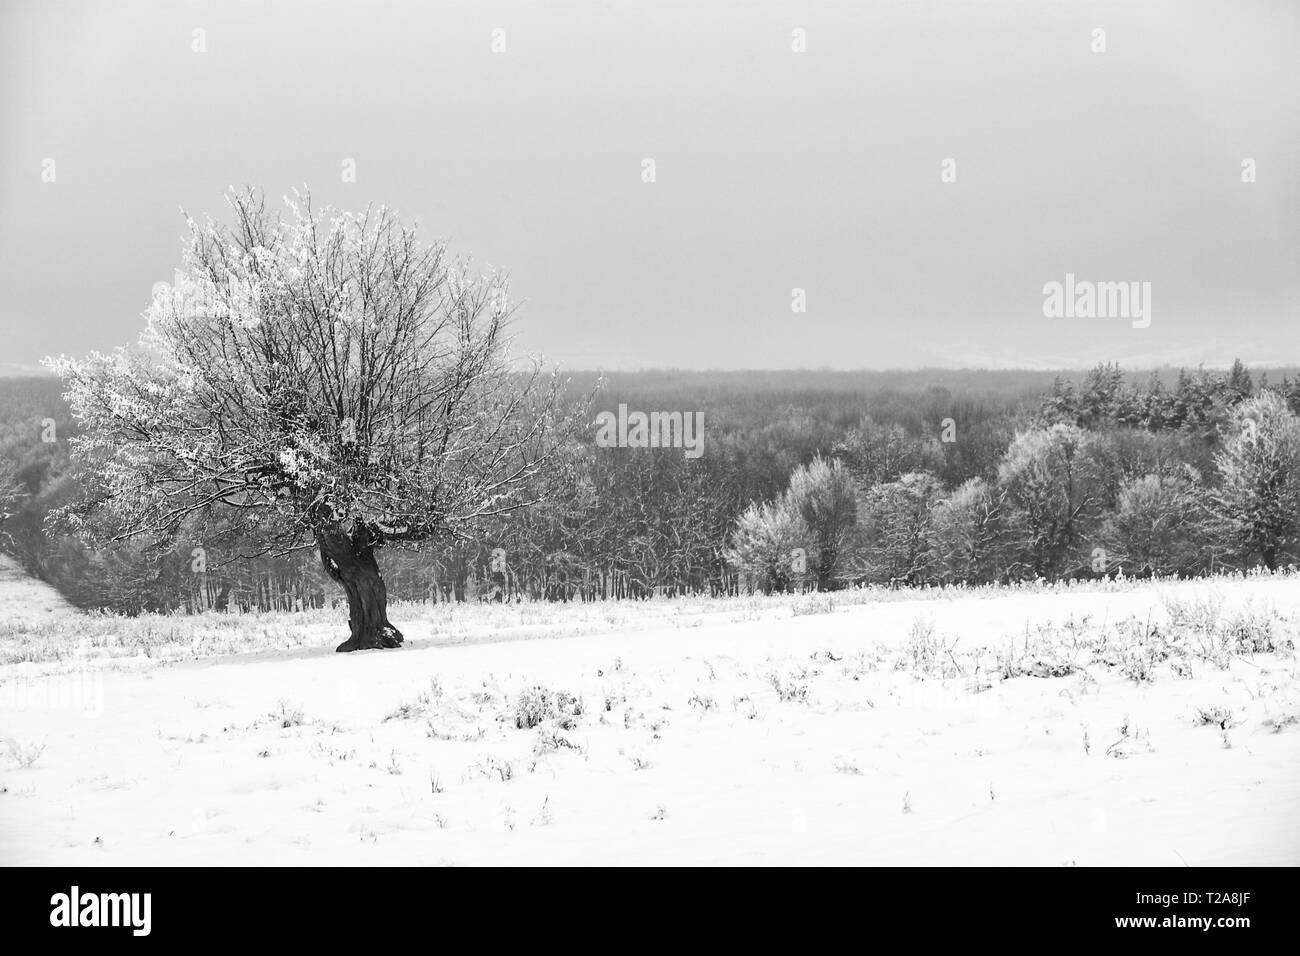 Wimter scenes around Tirgu Mures city, Marosvasarhely, Transylvania, Romania - Stock Image